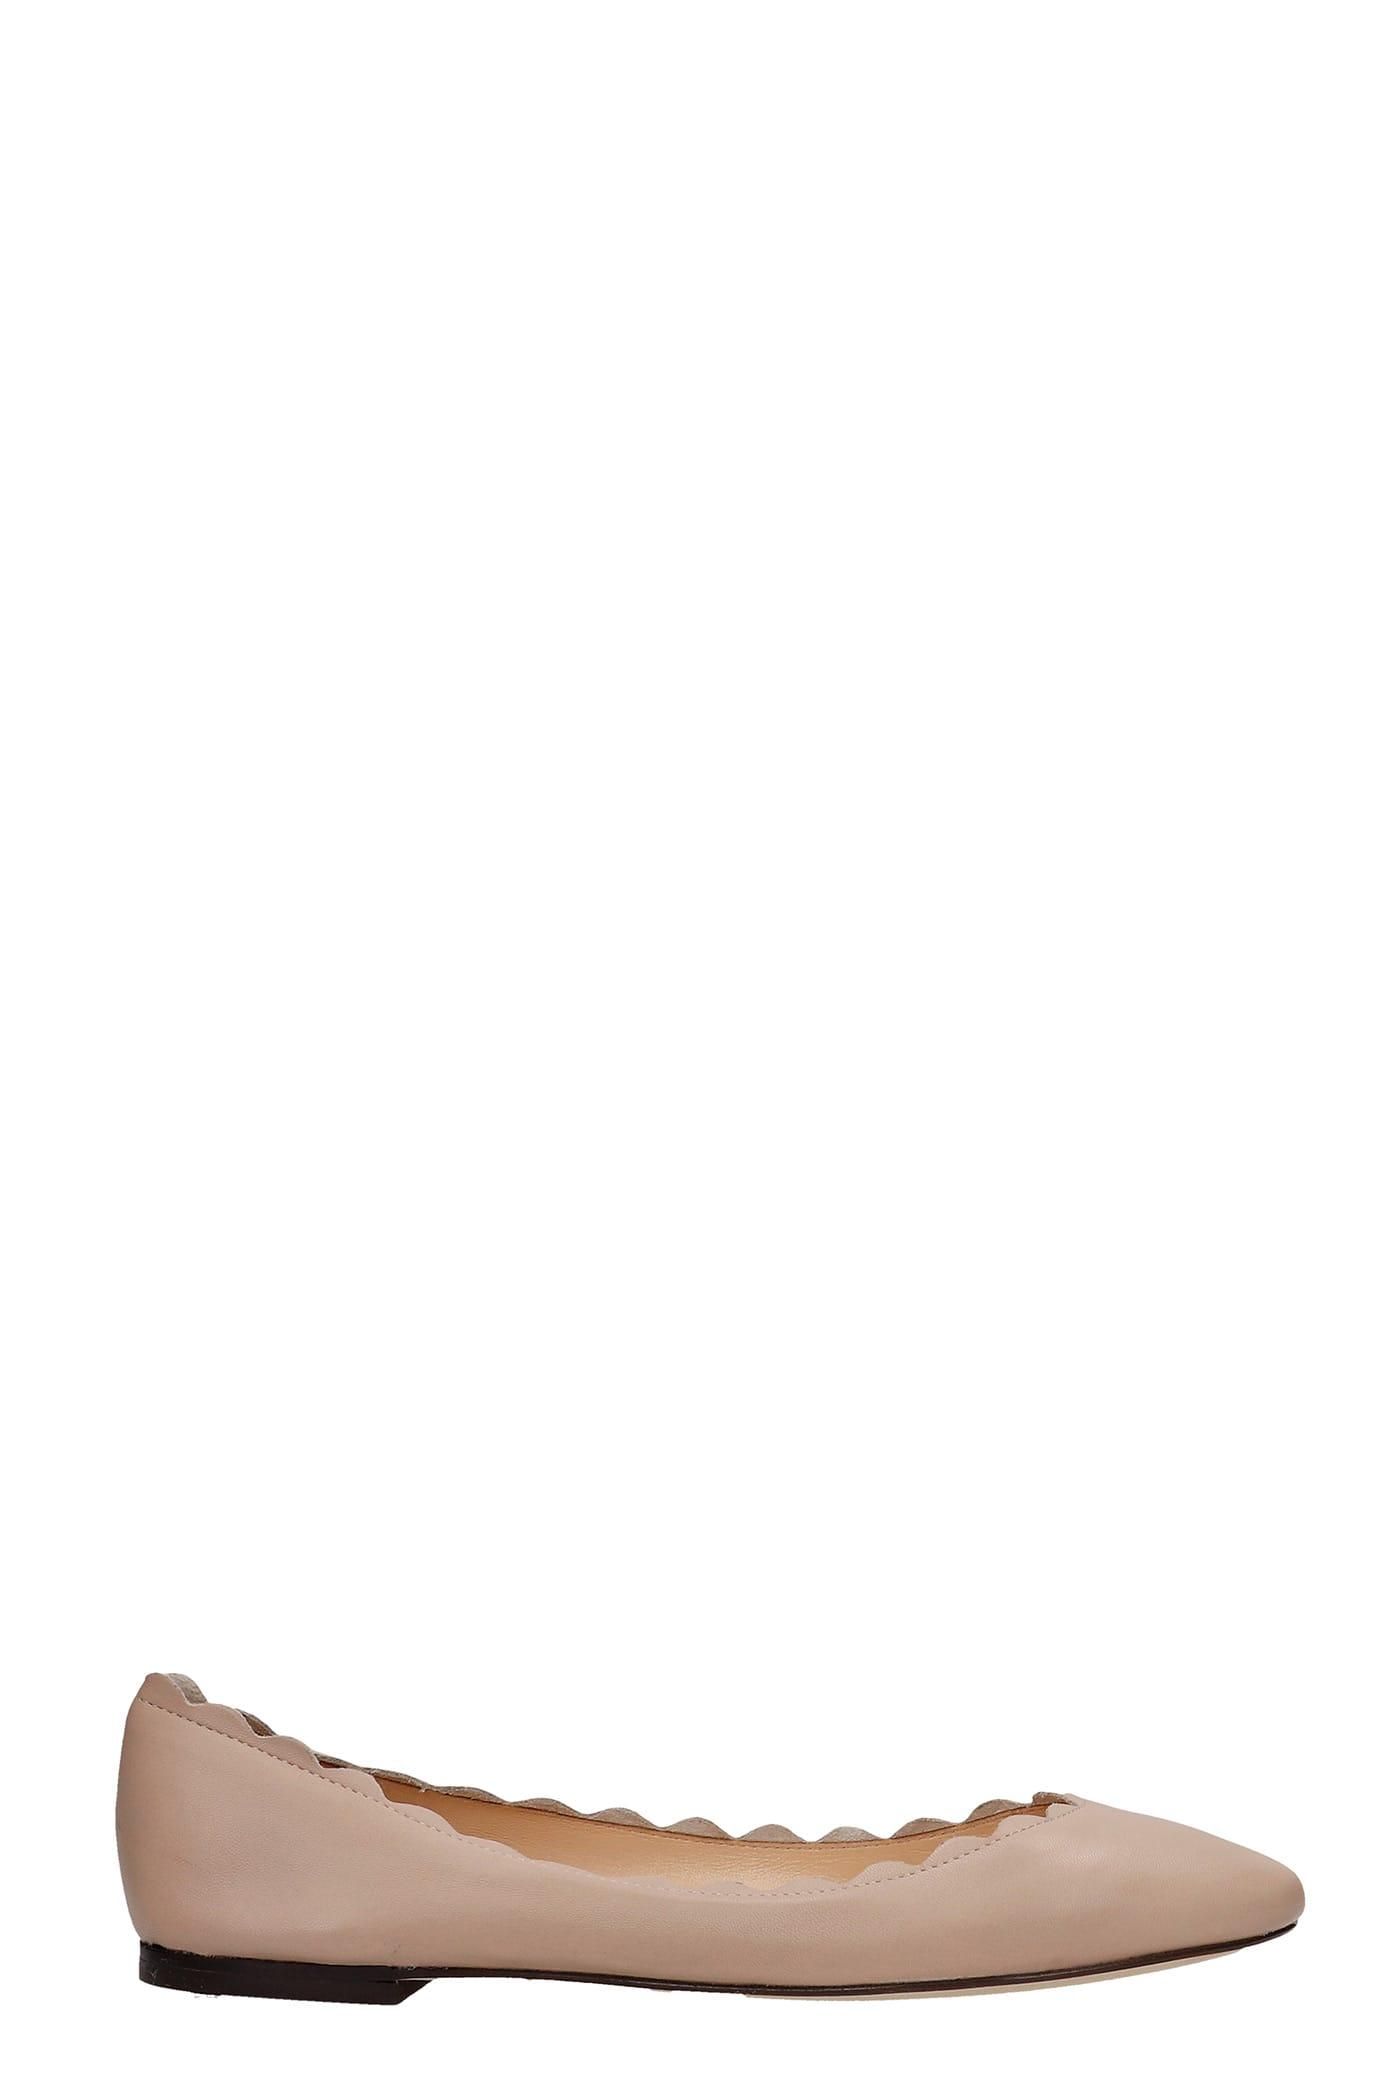 Ballet Flats In Beige Leather